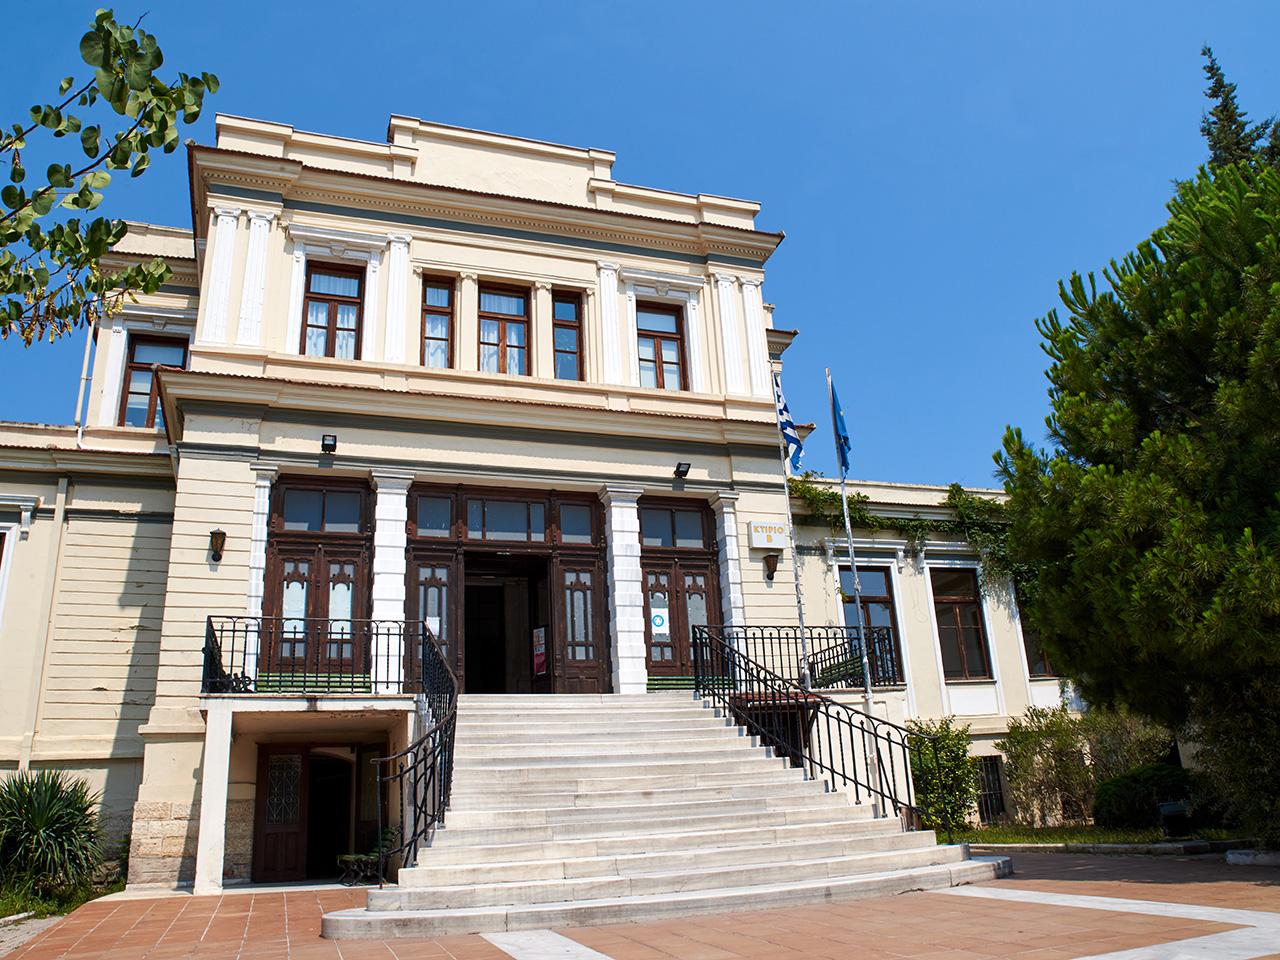 Hirsch Hospital - Jewish tour of Thessaloniki Greece - Thessaloniki Jewish Tour - Greek Jewish tours in Greece - Jewish Greek travel packages in Greece - Atlantis Travel Agency in Greece